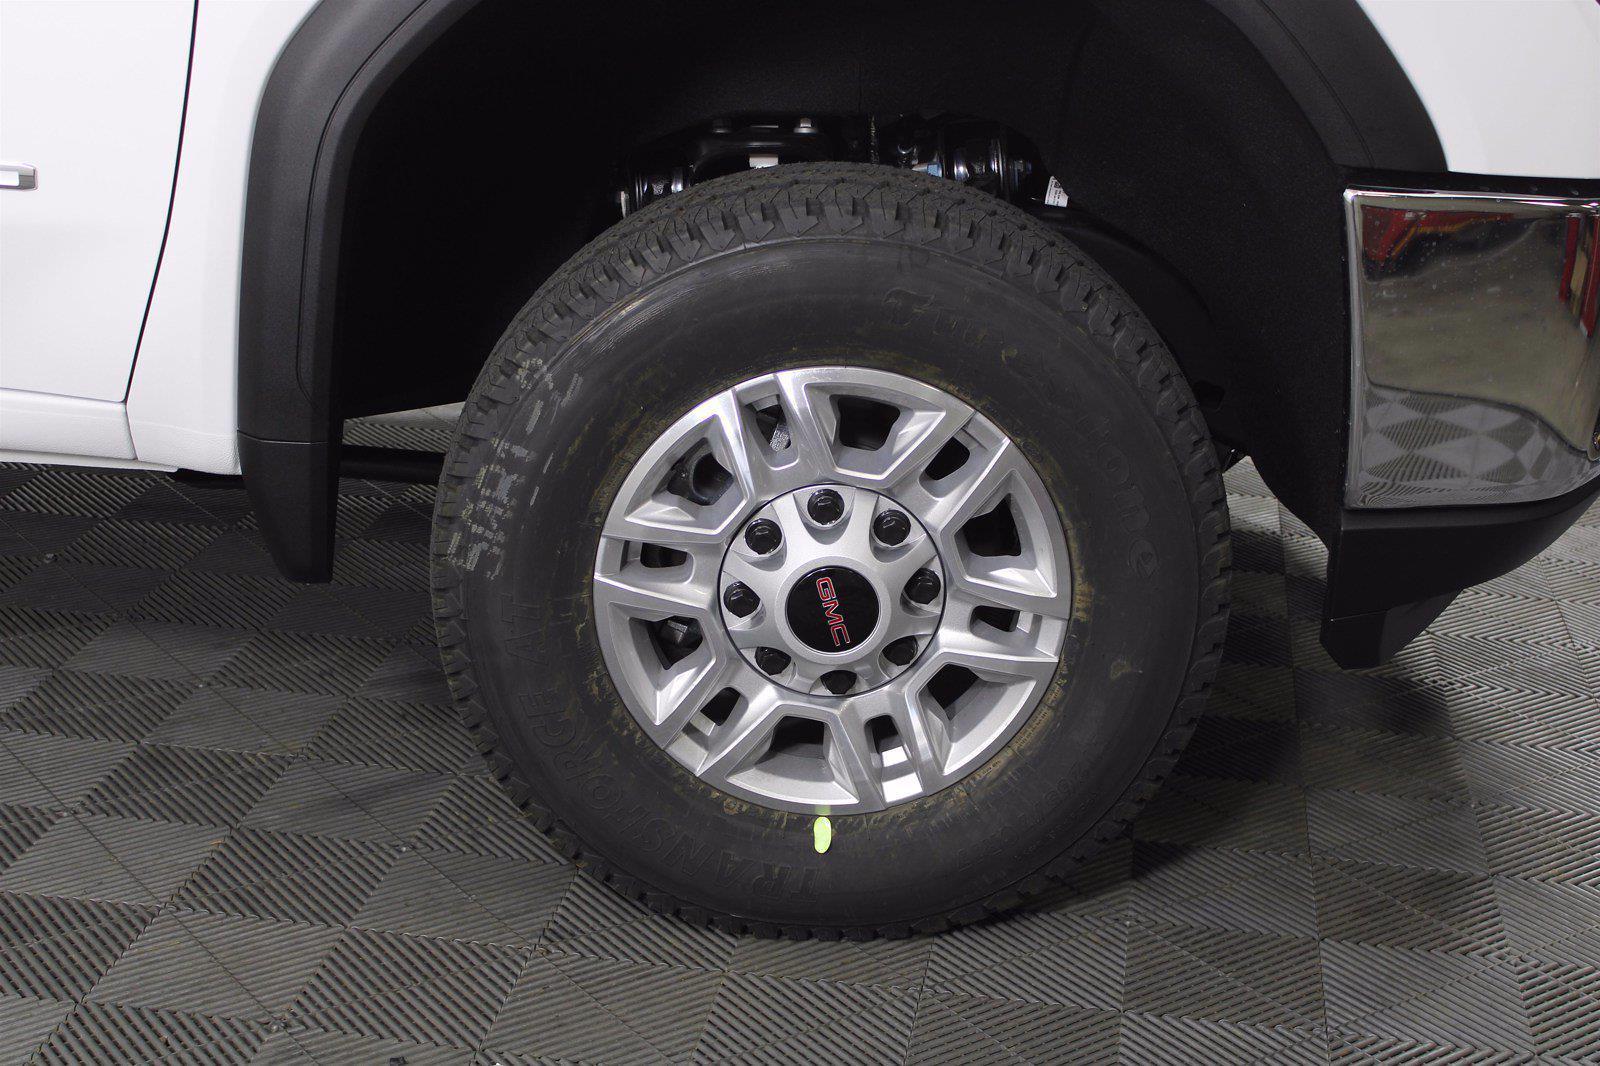 2022 Sierra 2500 Regular Cab 4x4,  Pickup #D420023 - photo 21